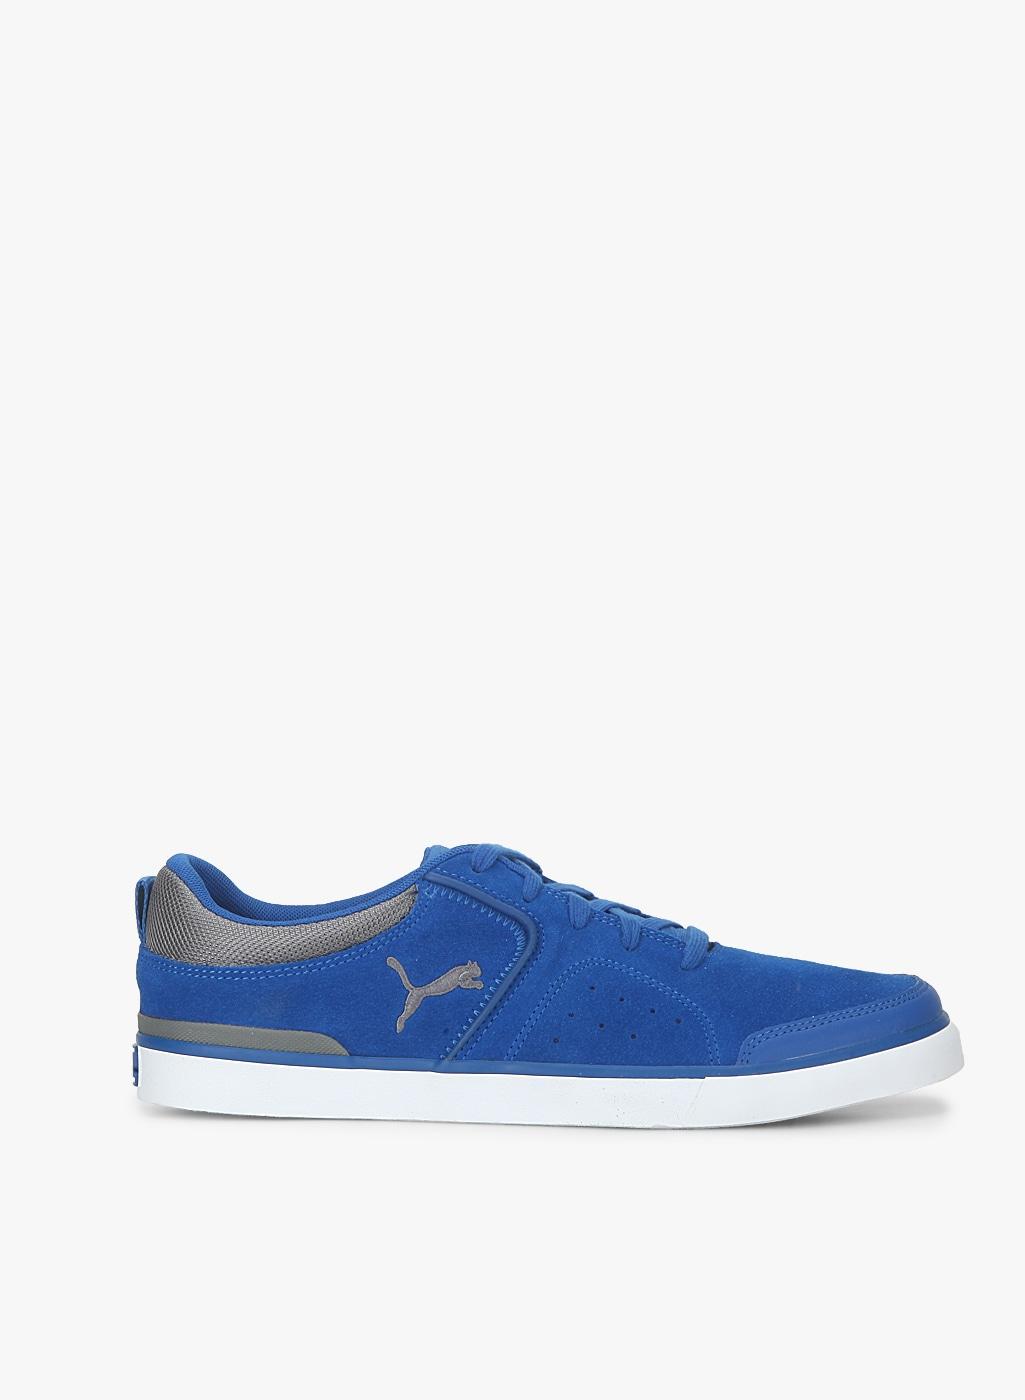 Funist Slider Vulc Sun Blue Sneakers